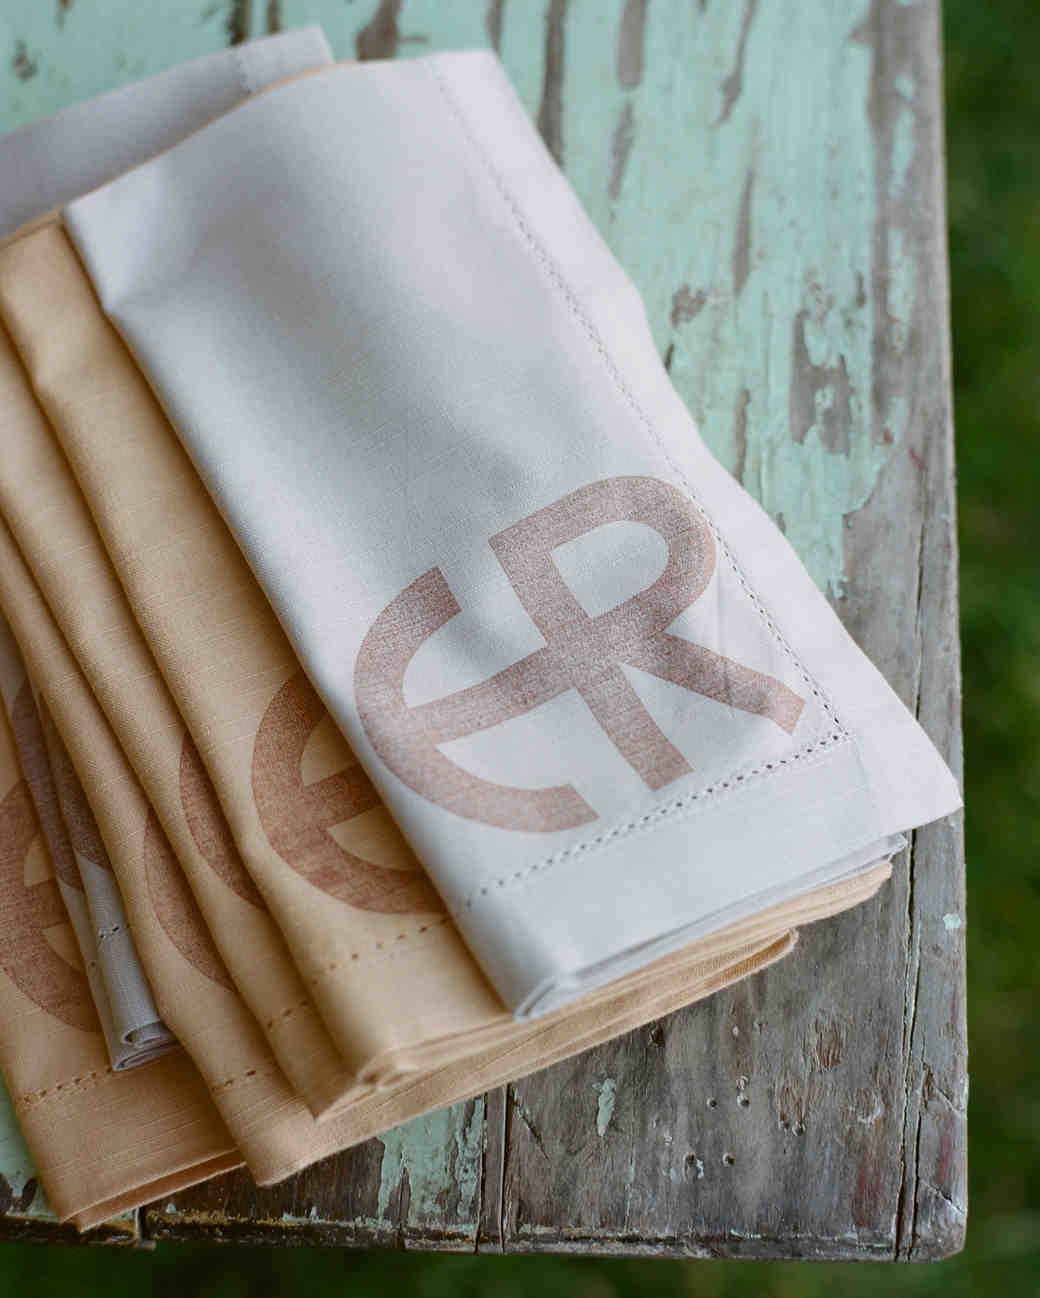 callie-eric-wedding-napkins-624-s112113-0815.jpg